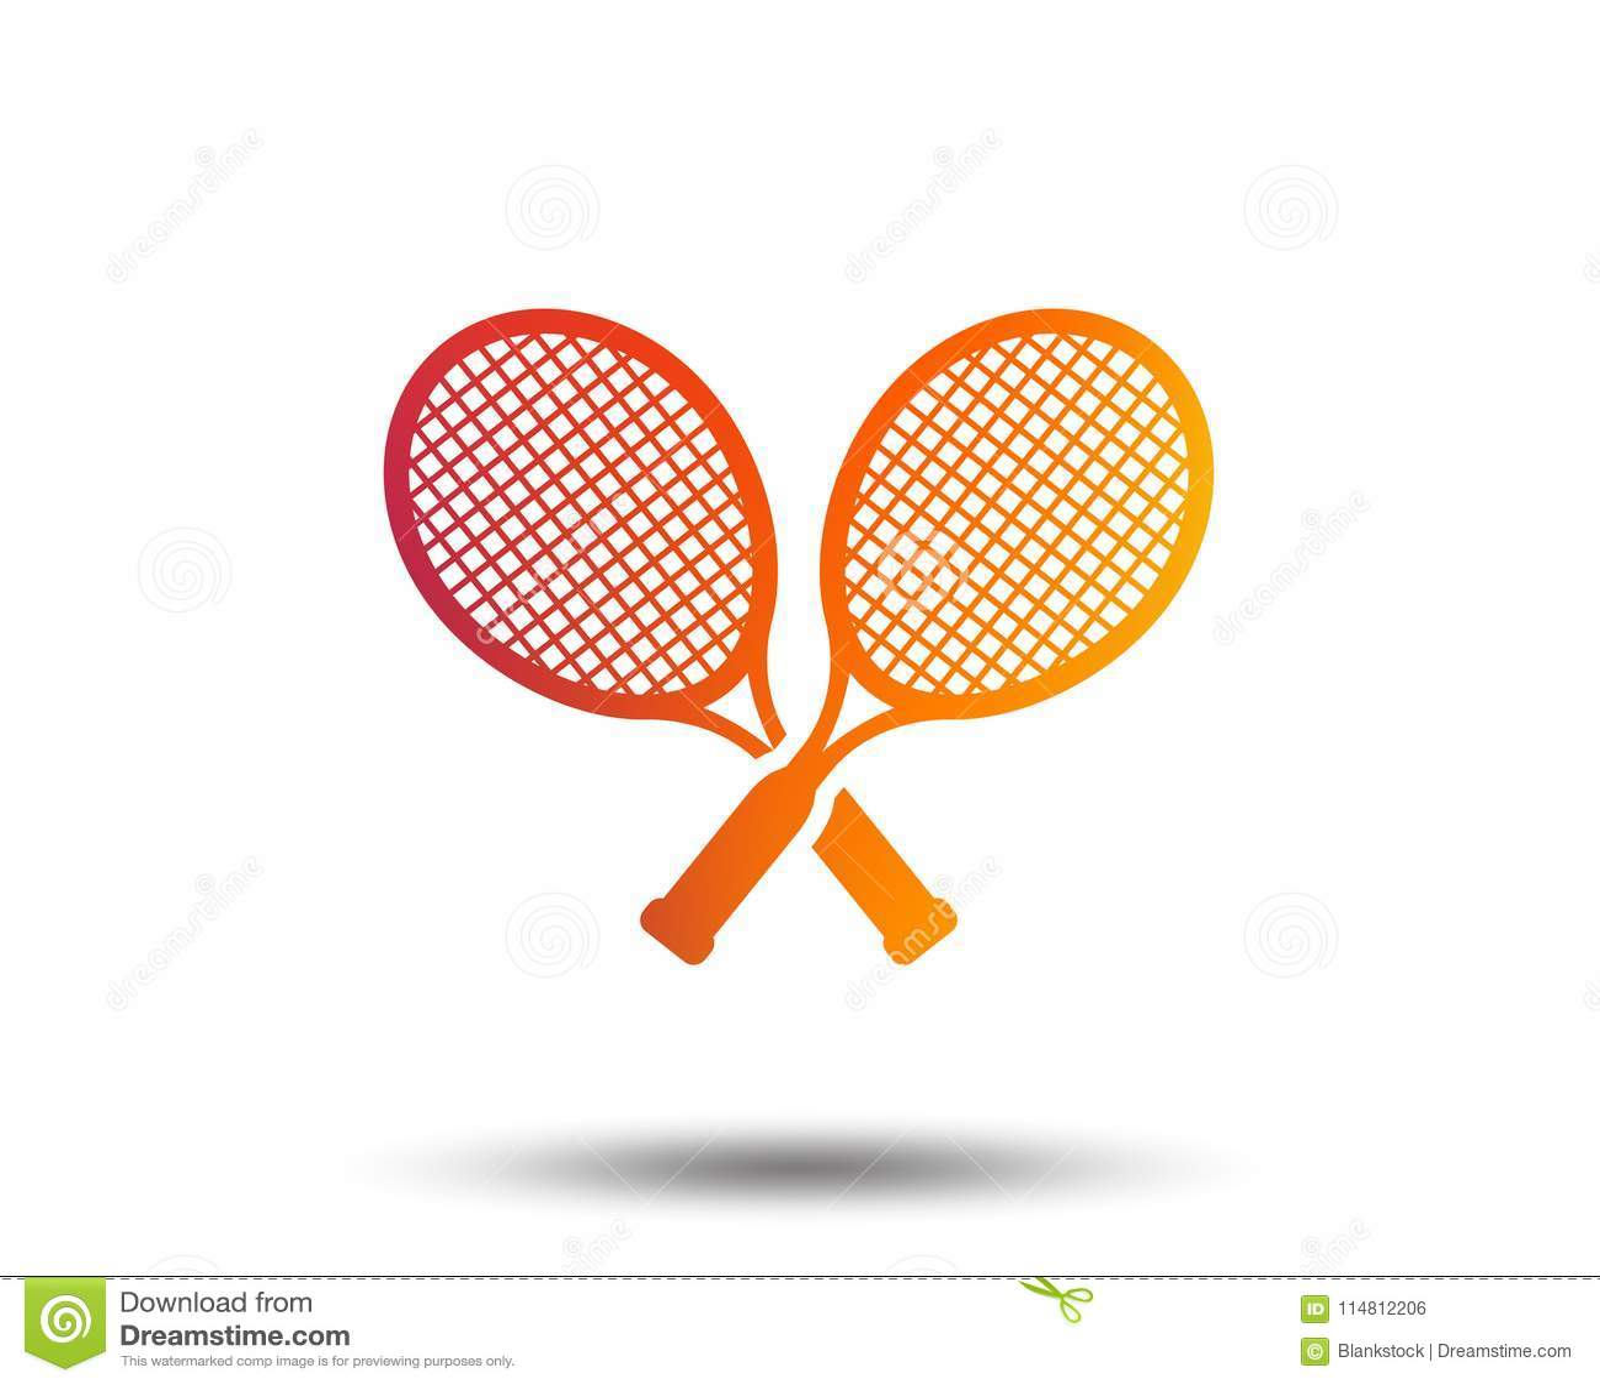 Tennis Rackets Sign Icon Sport Symbol Stock Vector Illustration